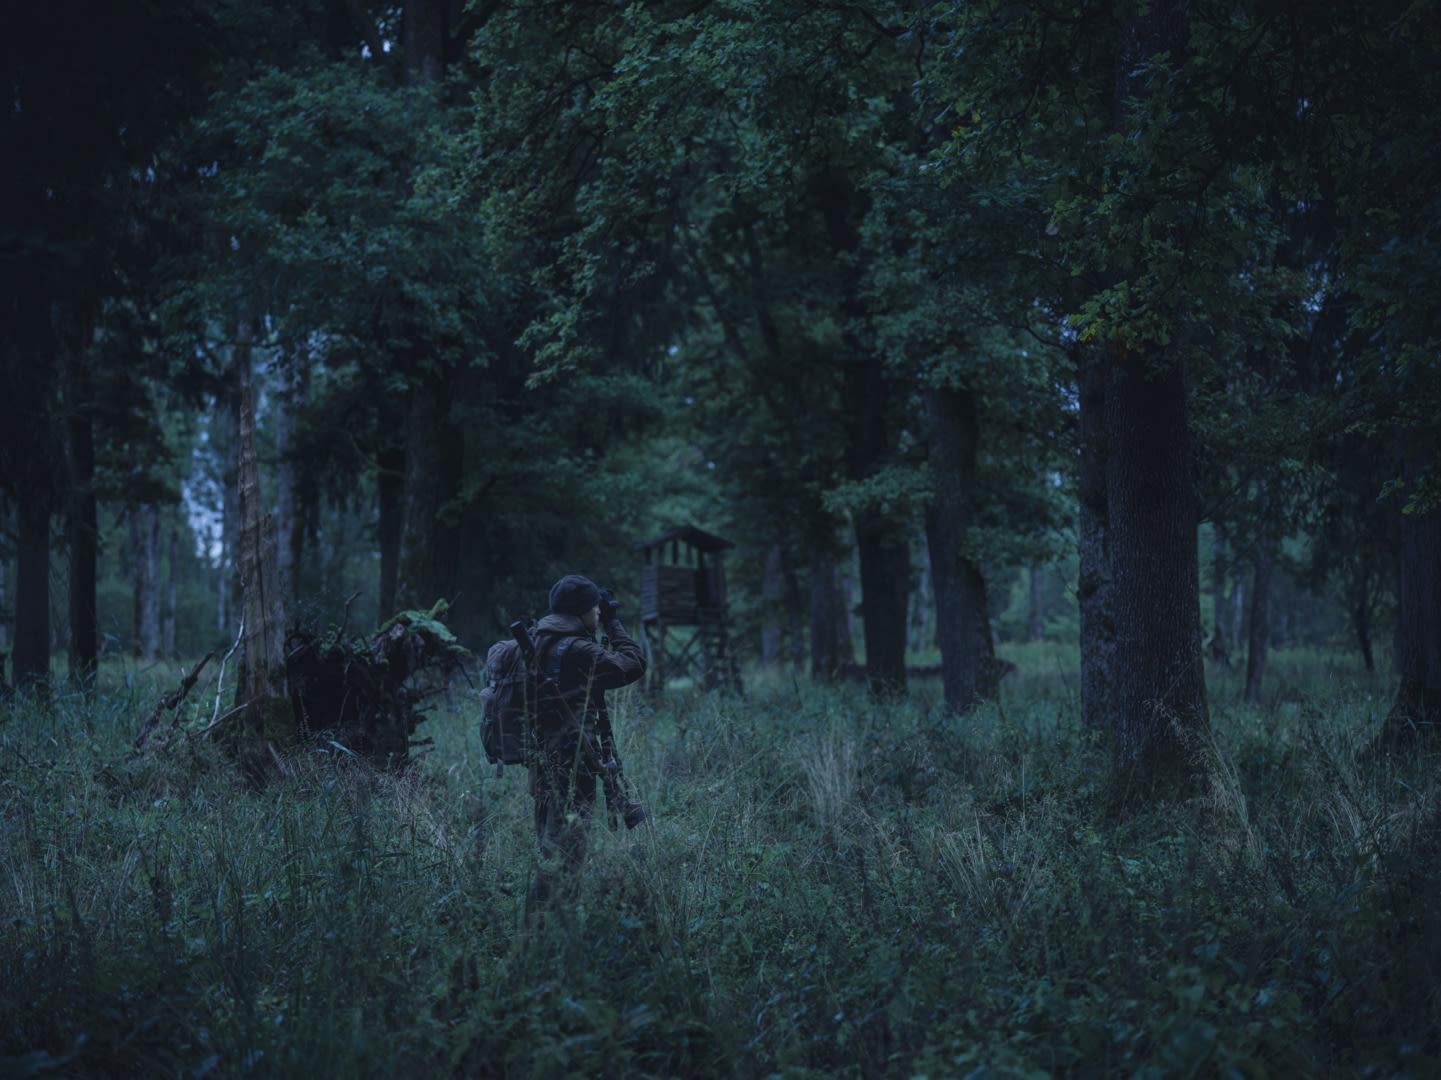 forest hunter thermal imaging tm 35